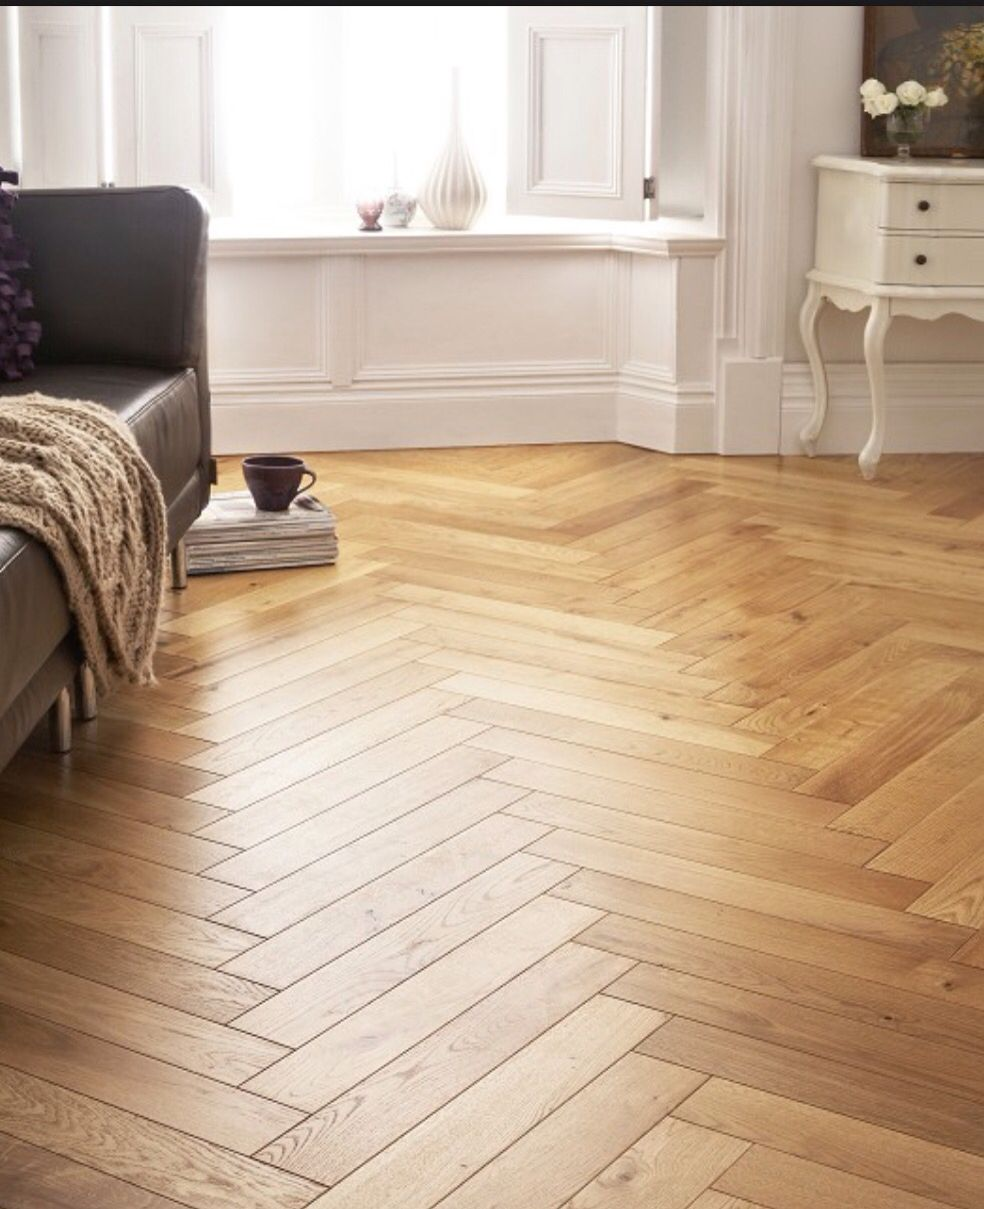 Flooring and skirting Herringbone laminate flooring